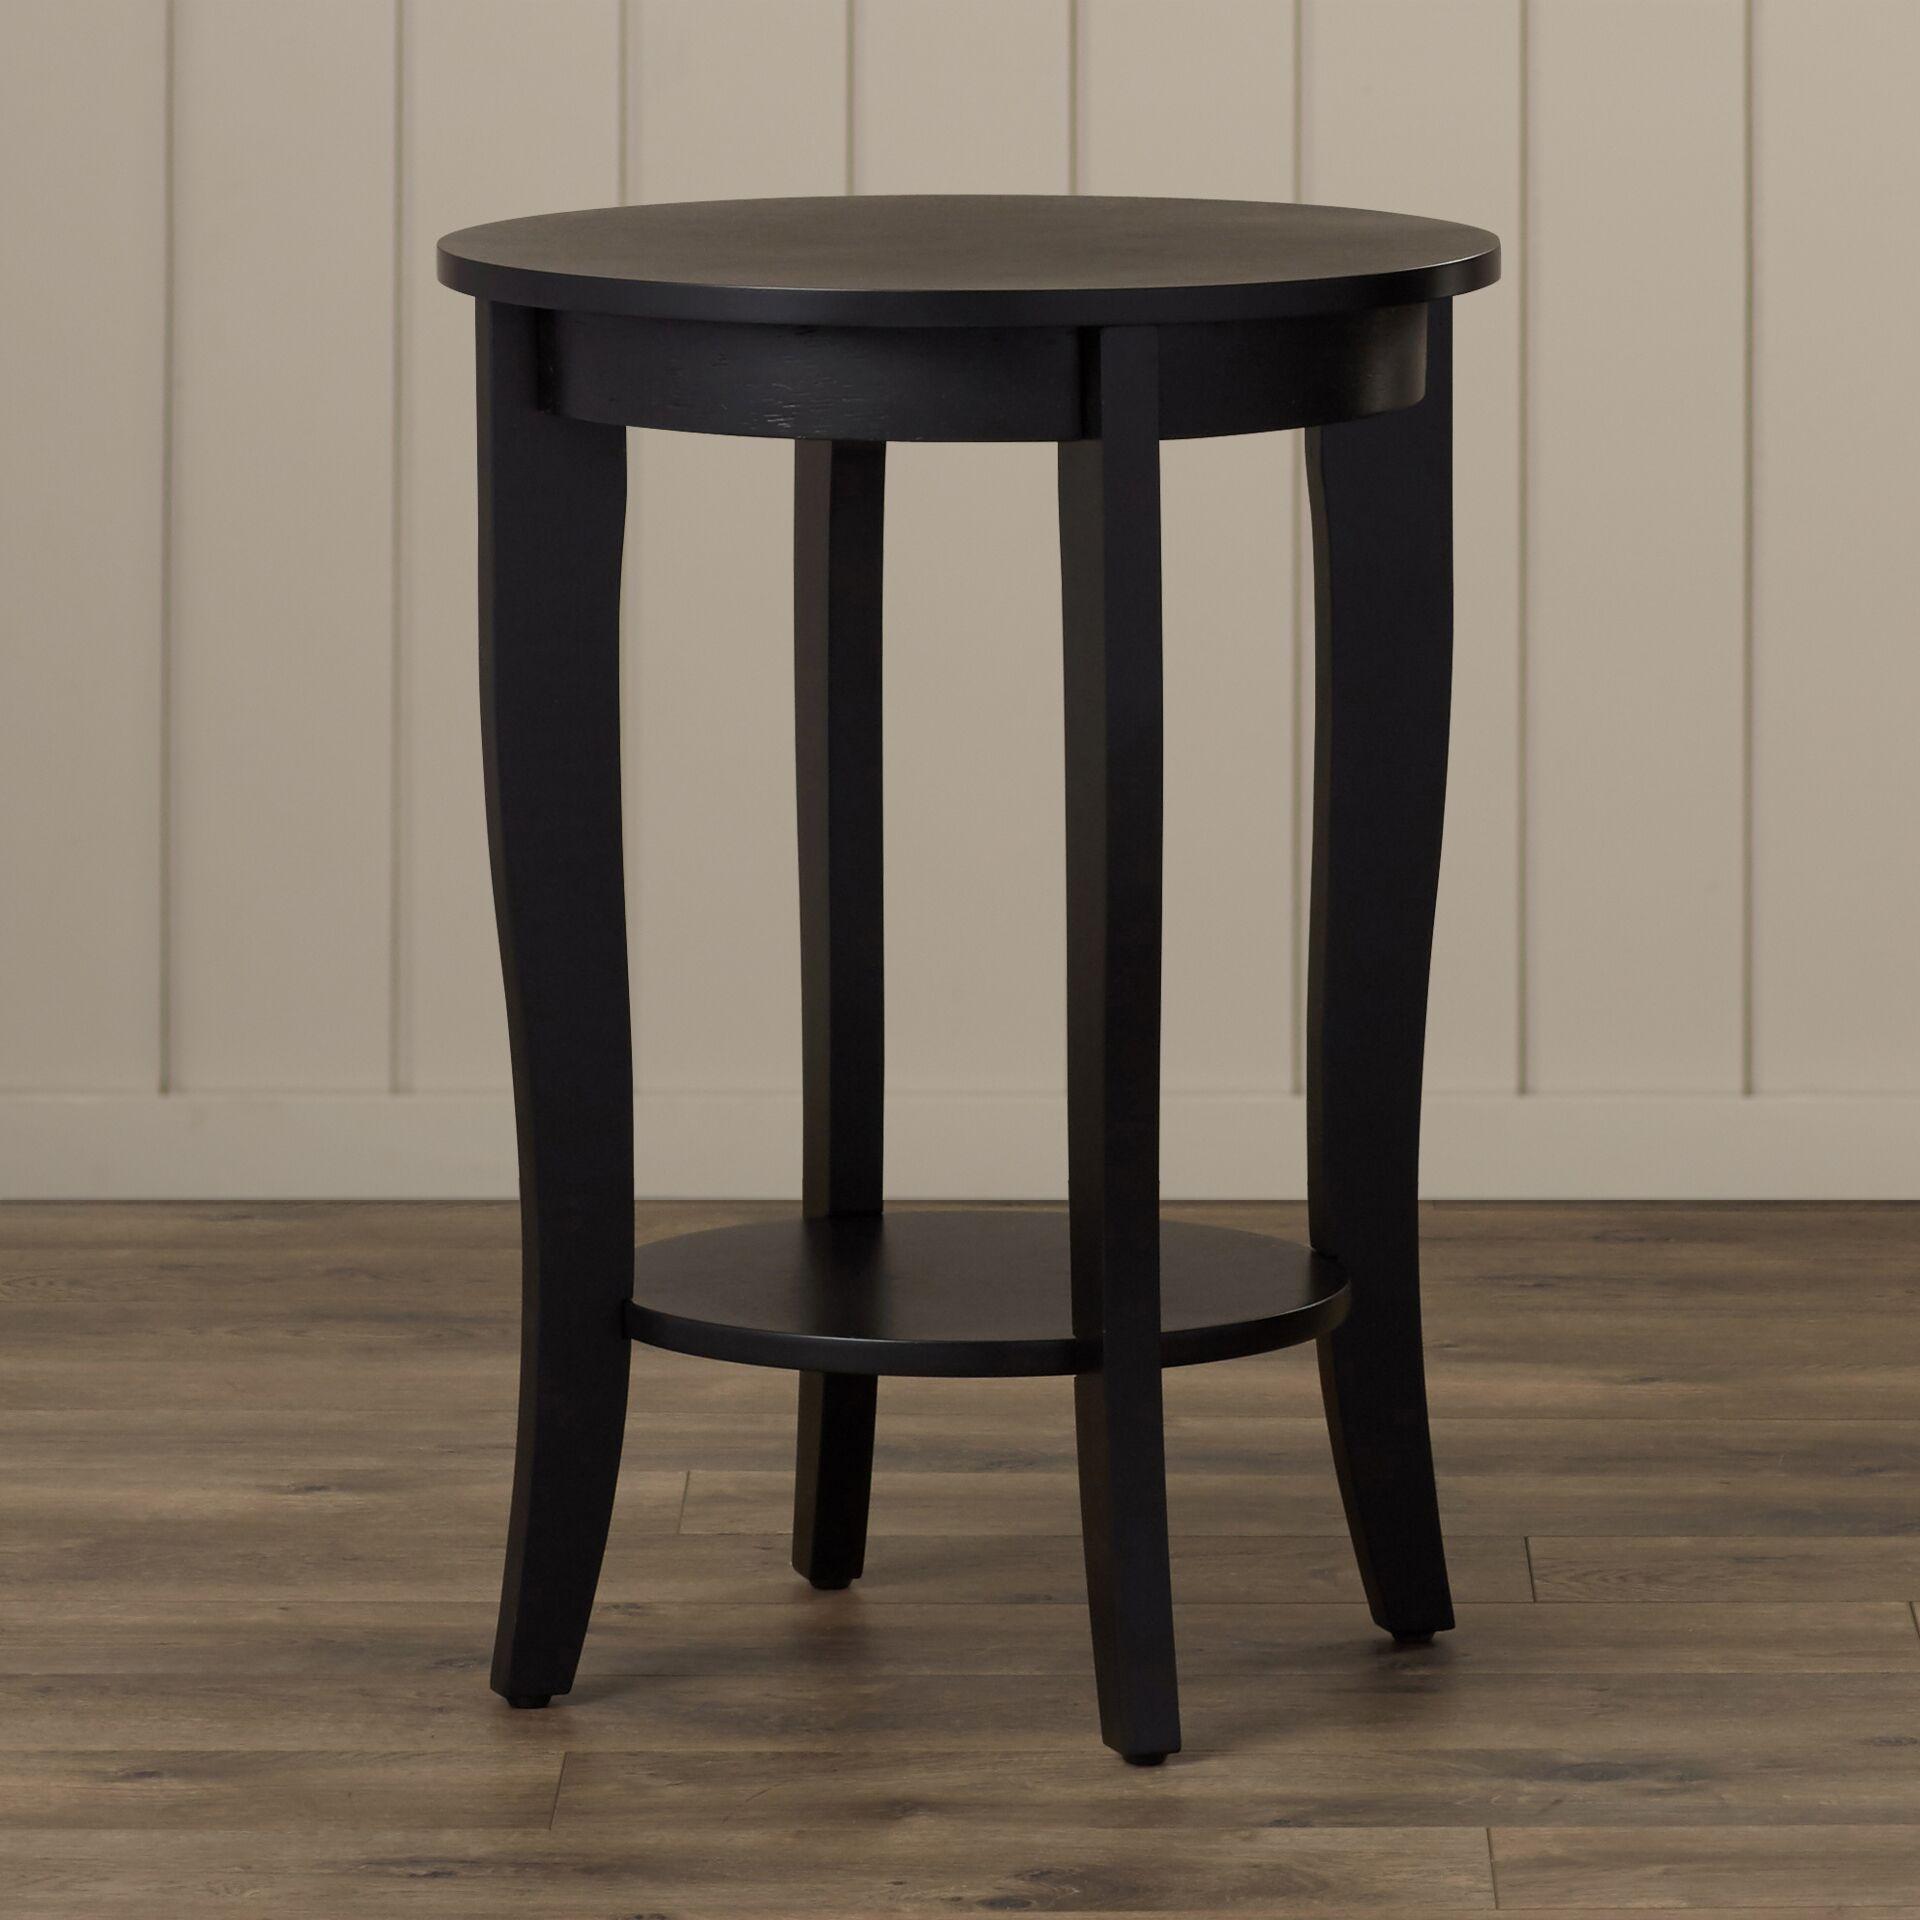 Lucile End Table Table Top Color: Espresso, Table Base Color: Espresso